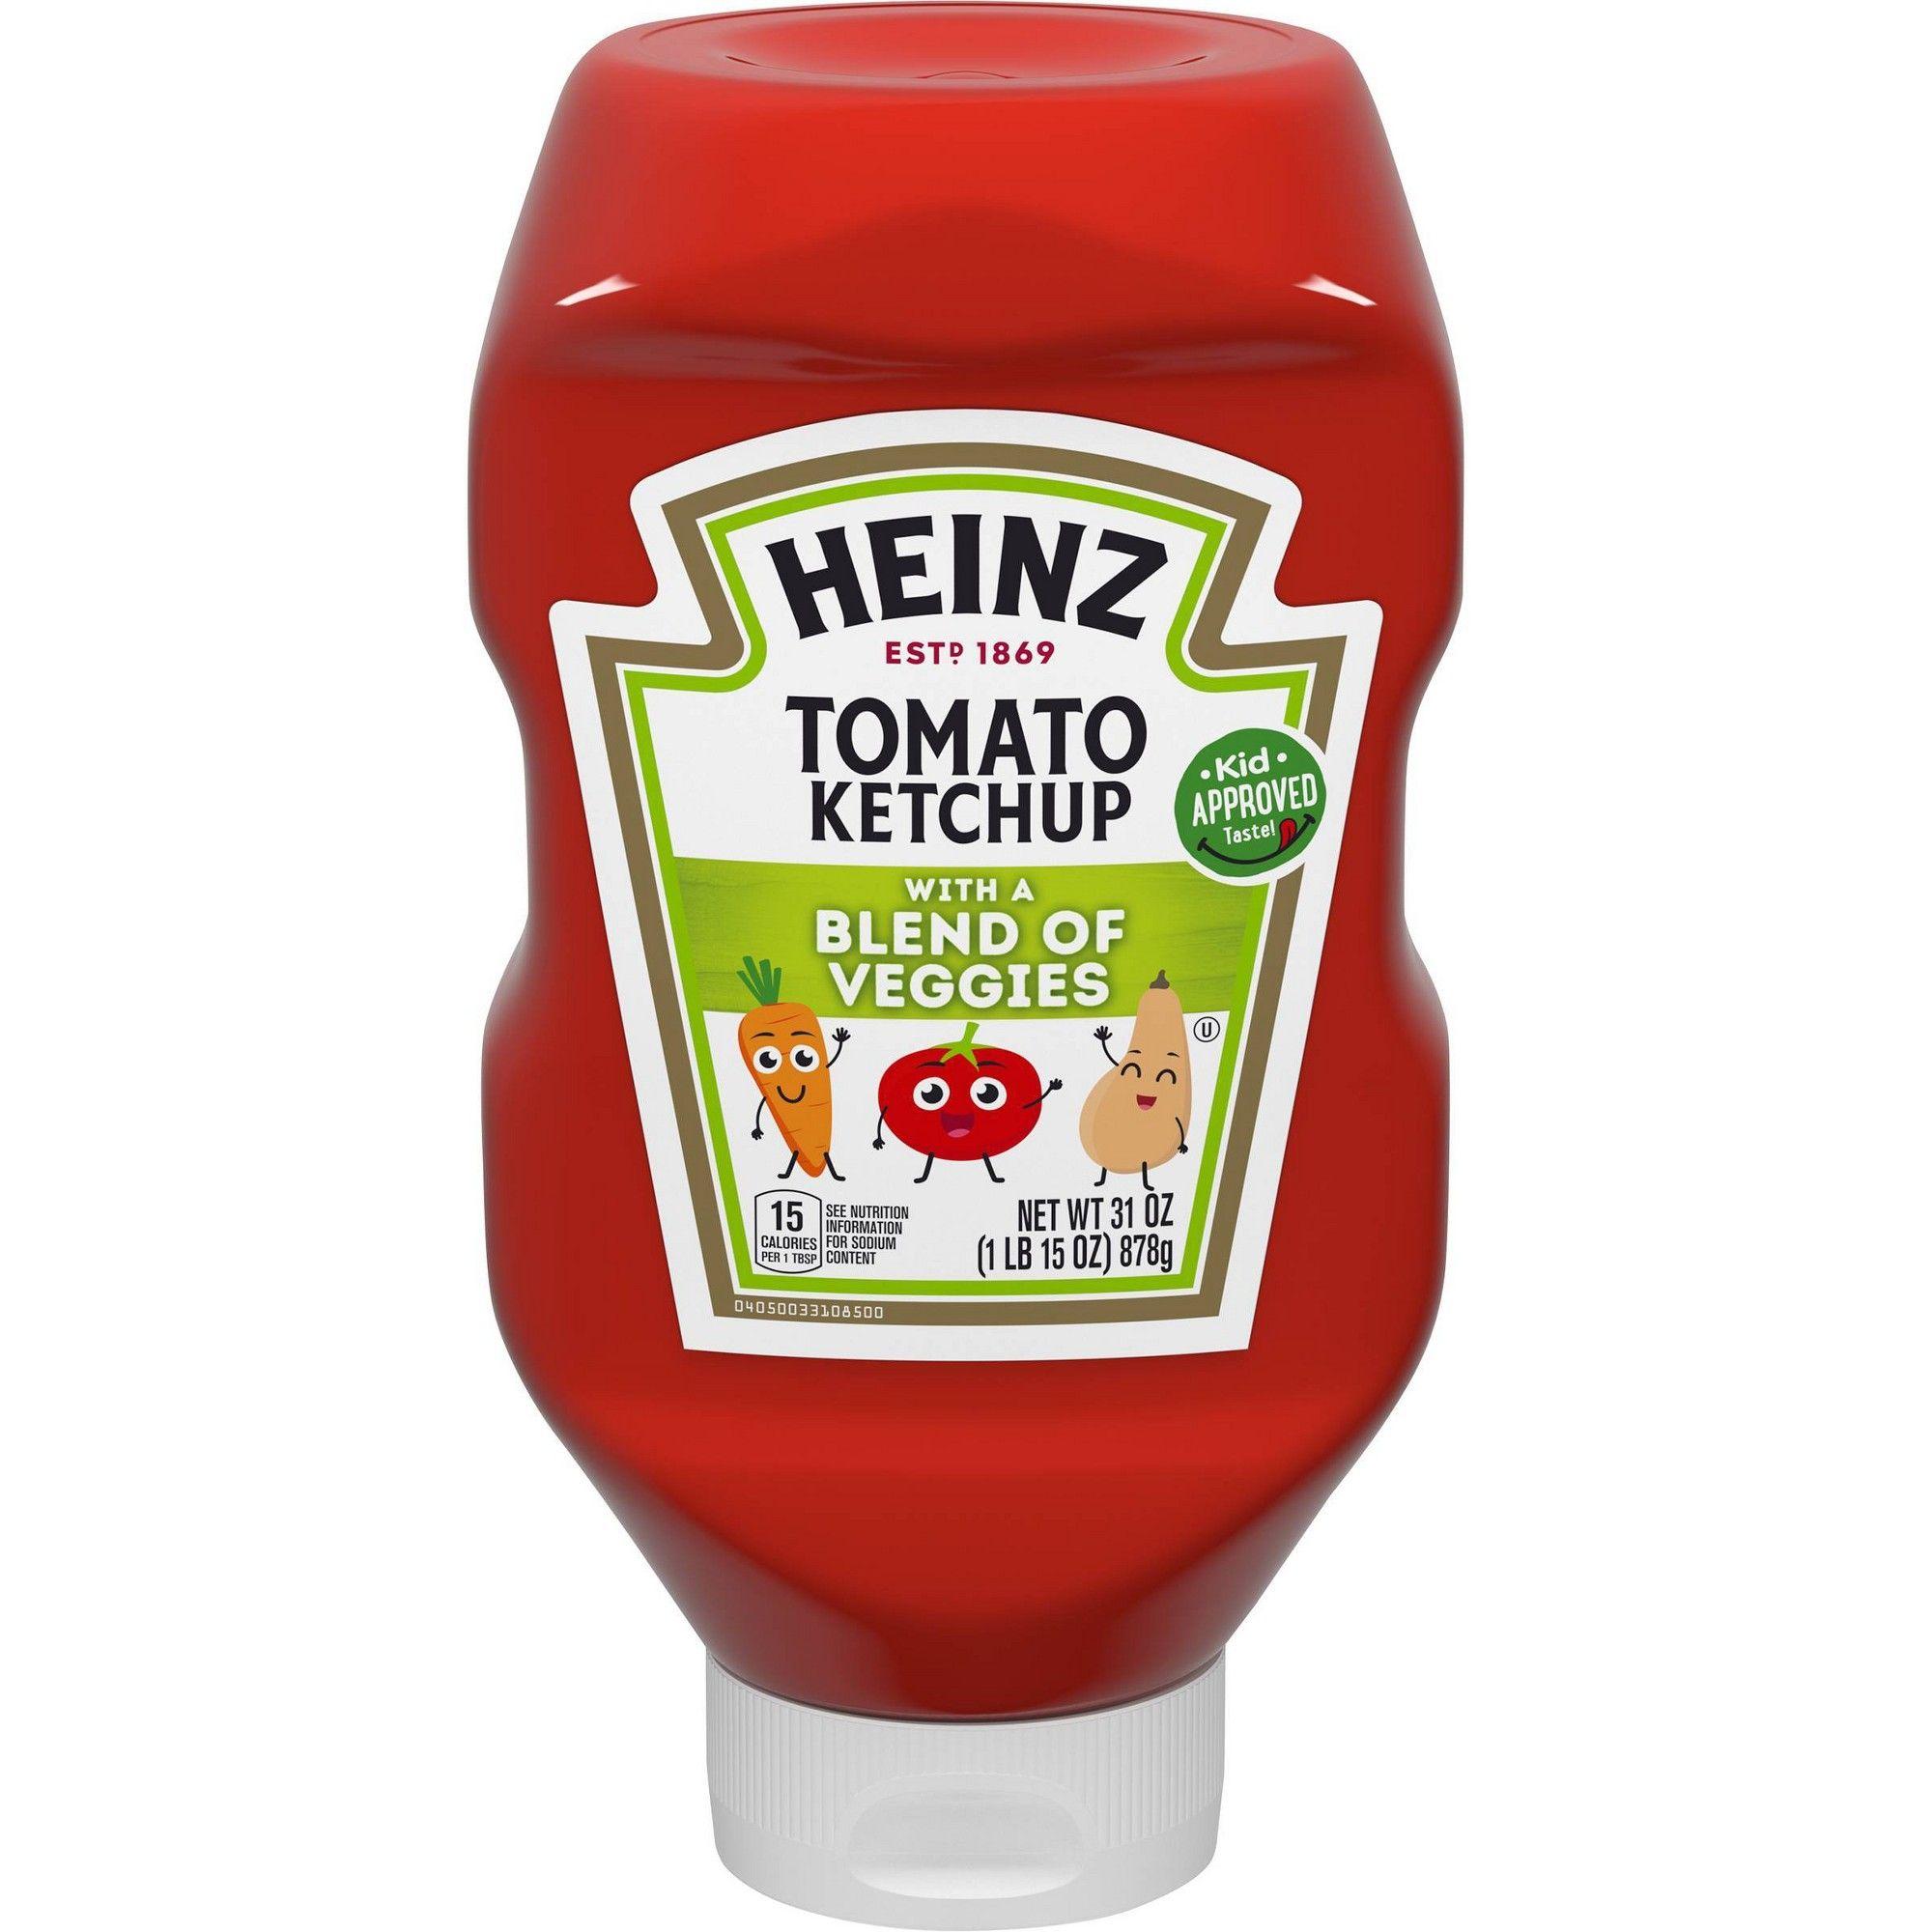 Heinz veggie blended ketchup 32oz ketchup veggies